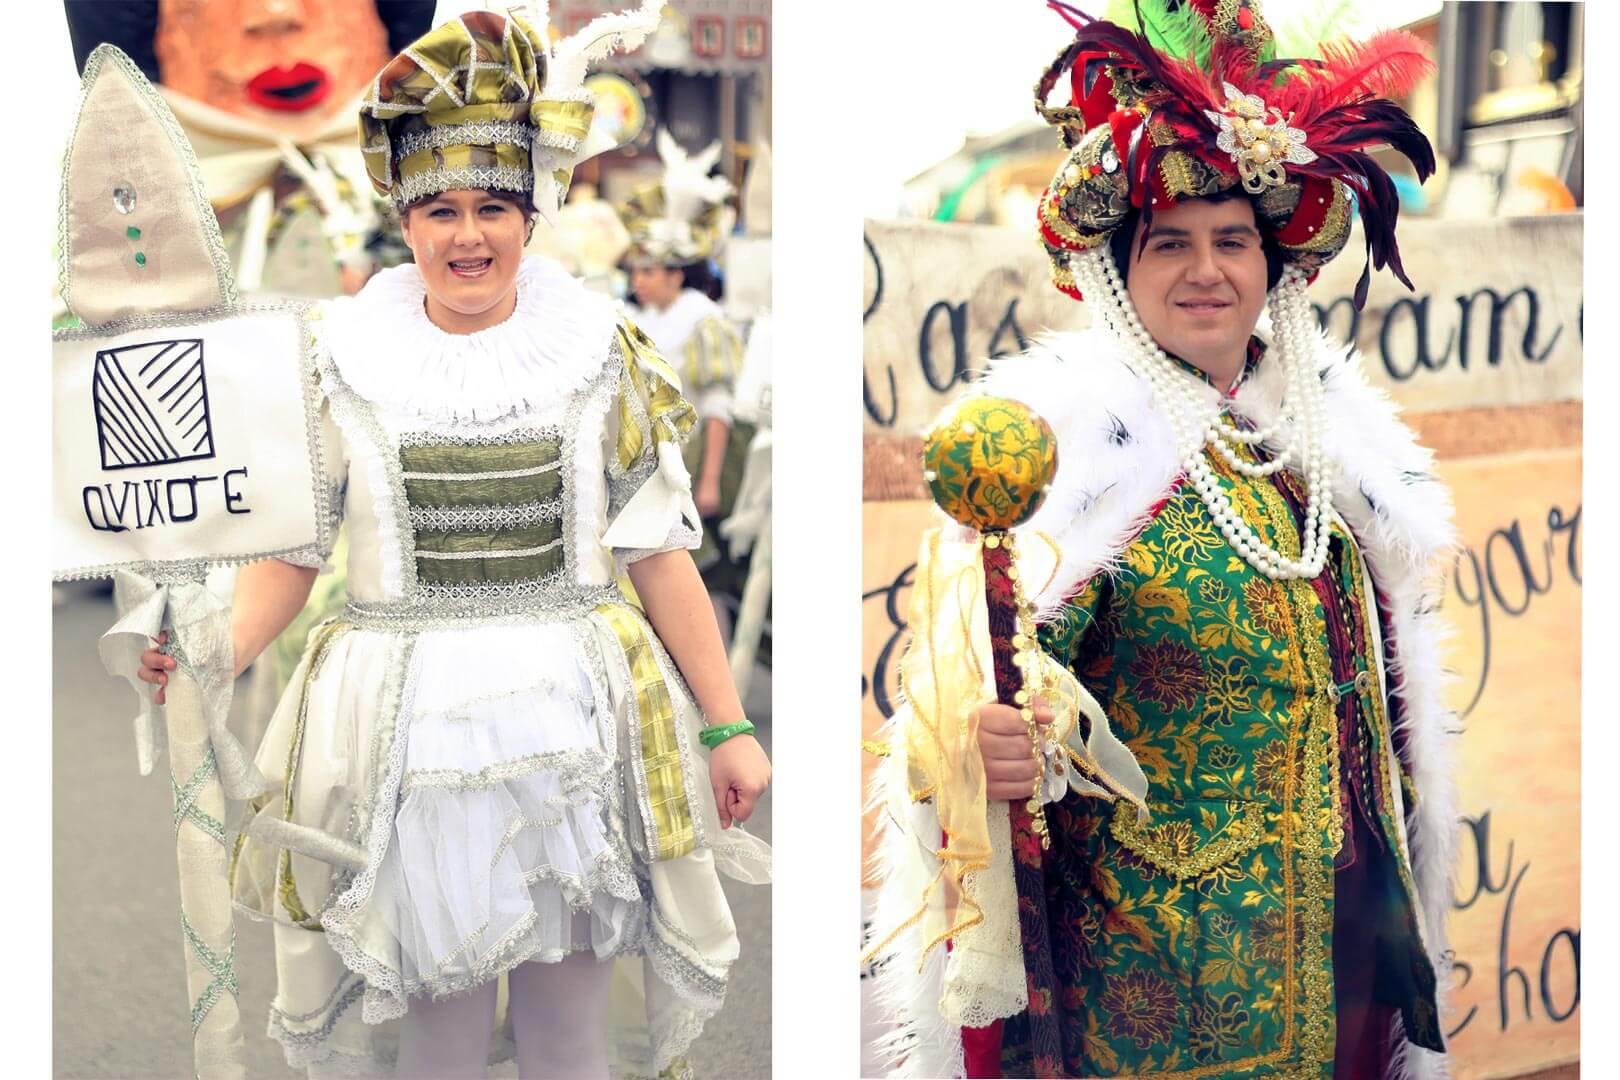 Costura Carnaval y Musicales